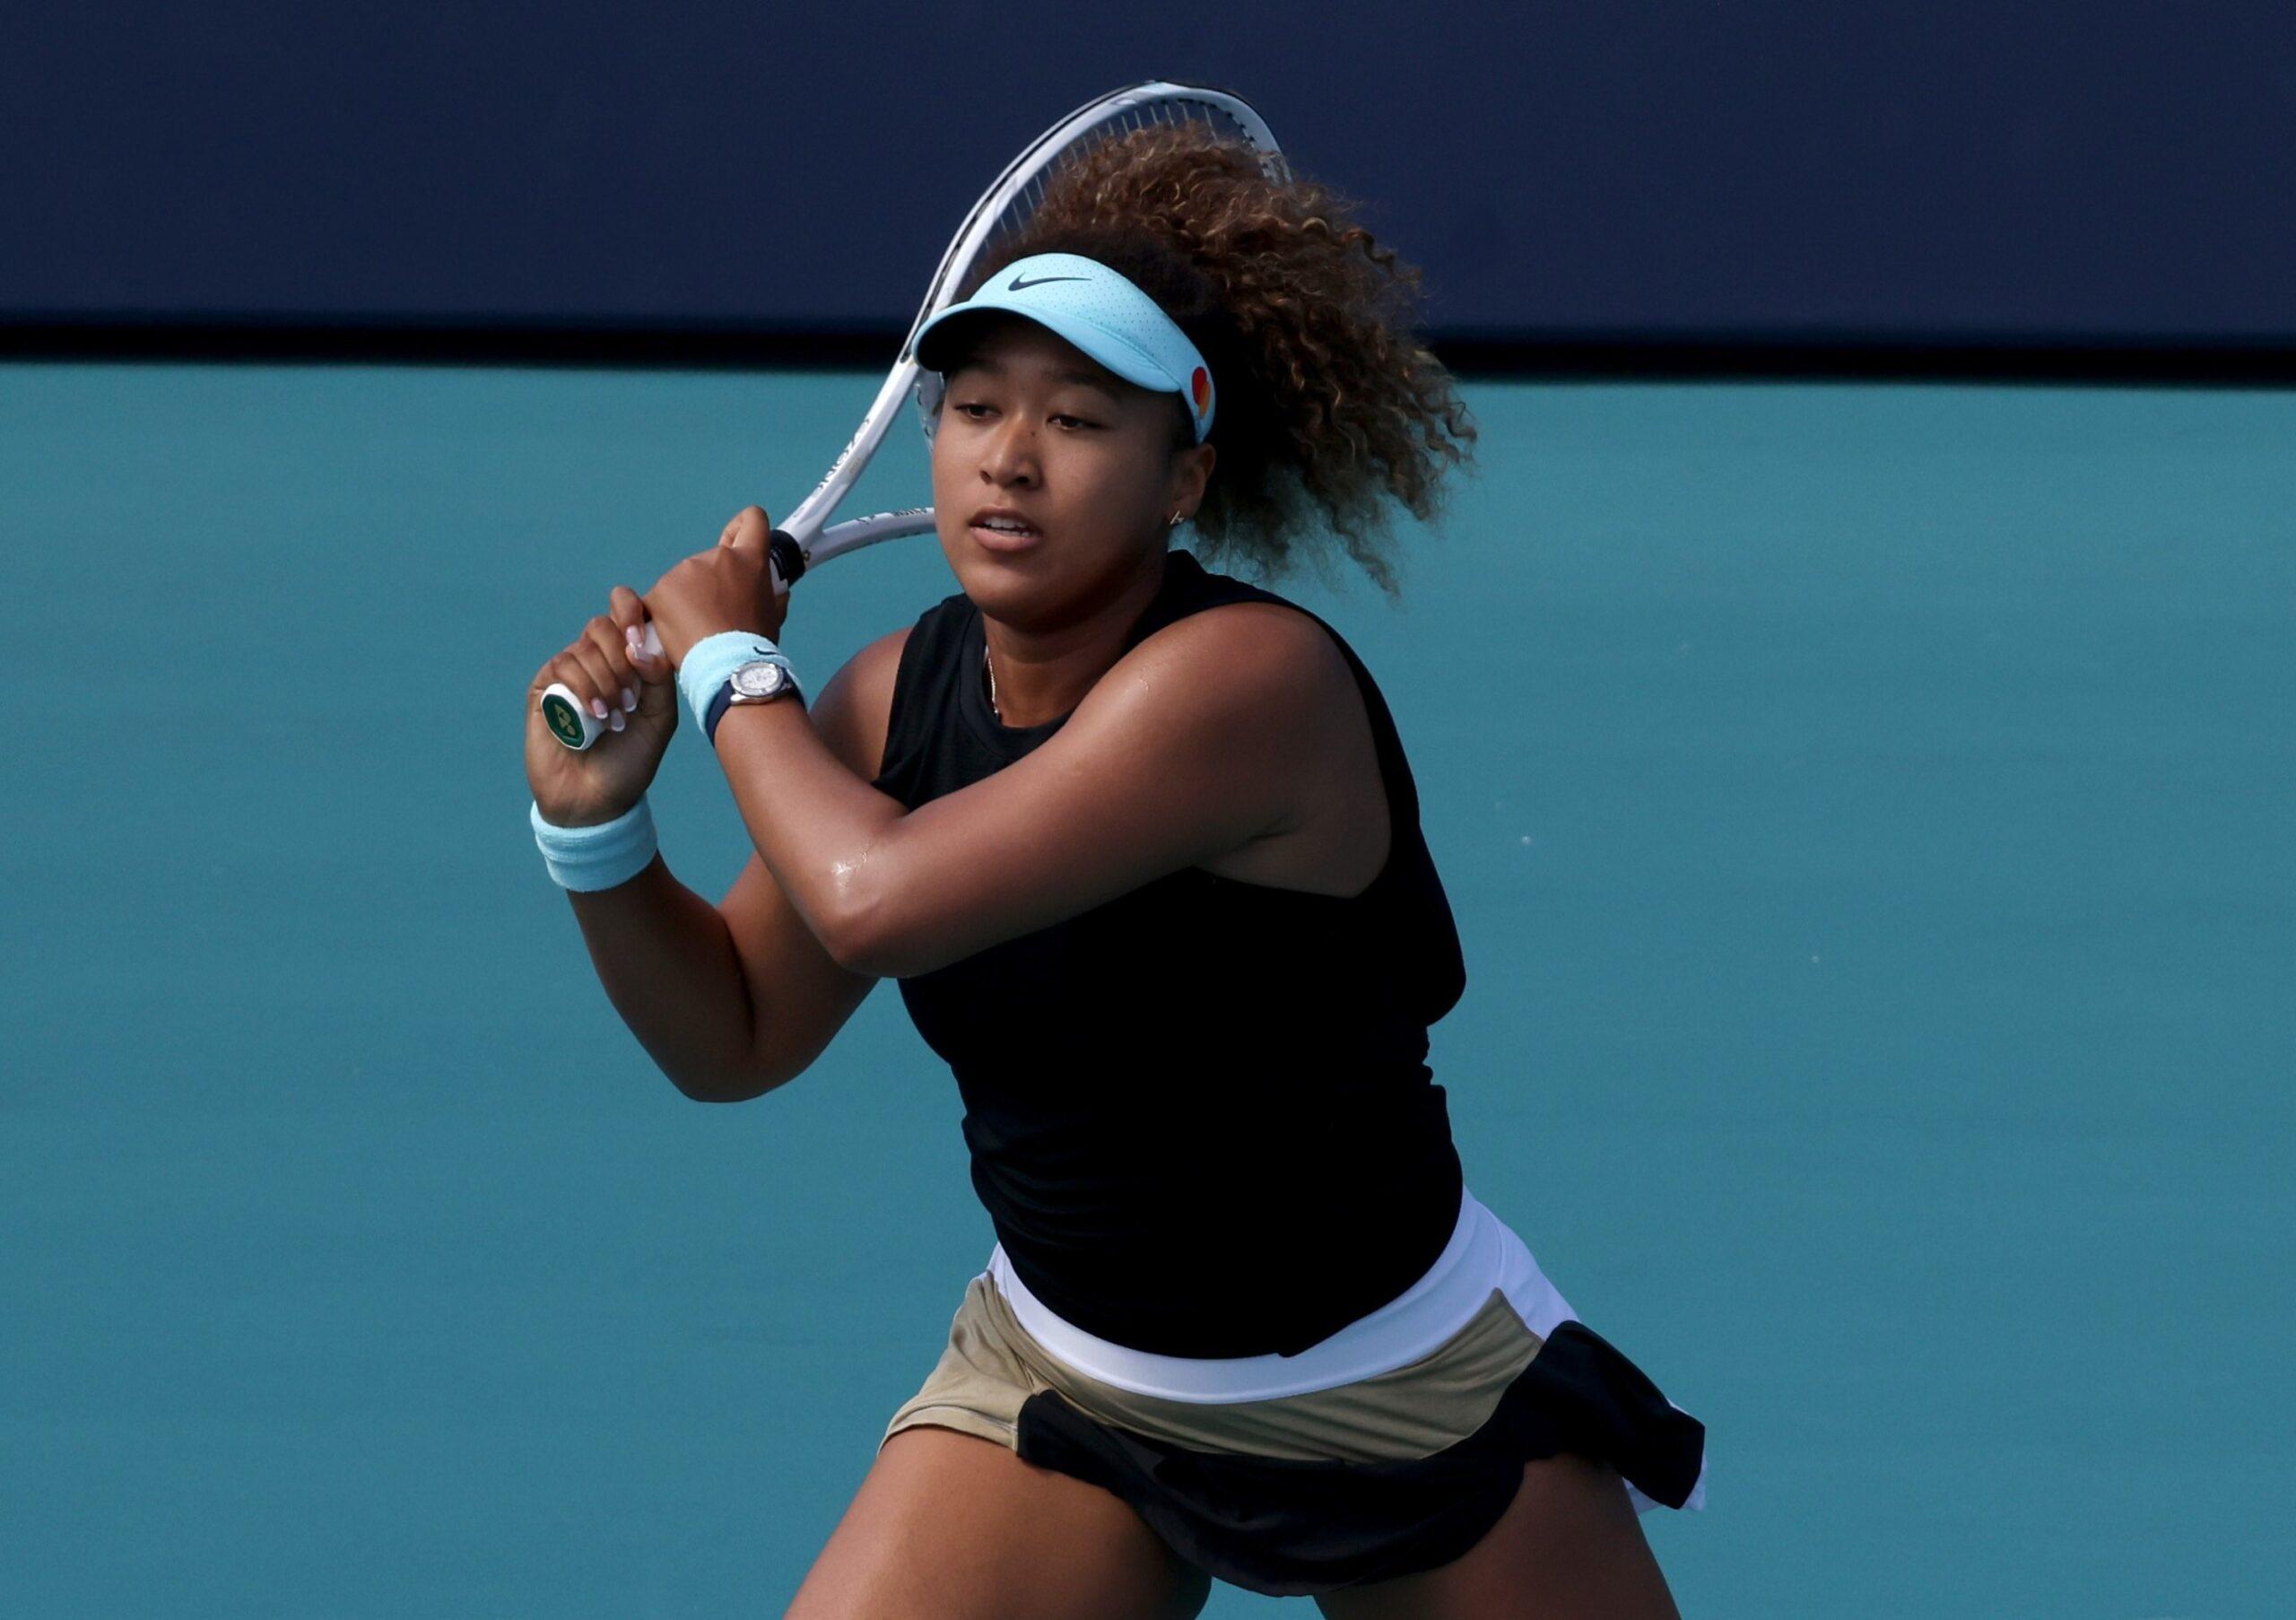 Naomi Osaka of Japan in quarterfinals of Miami Open